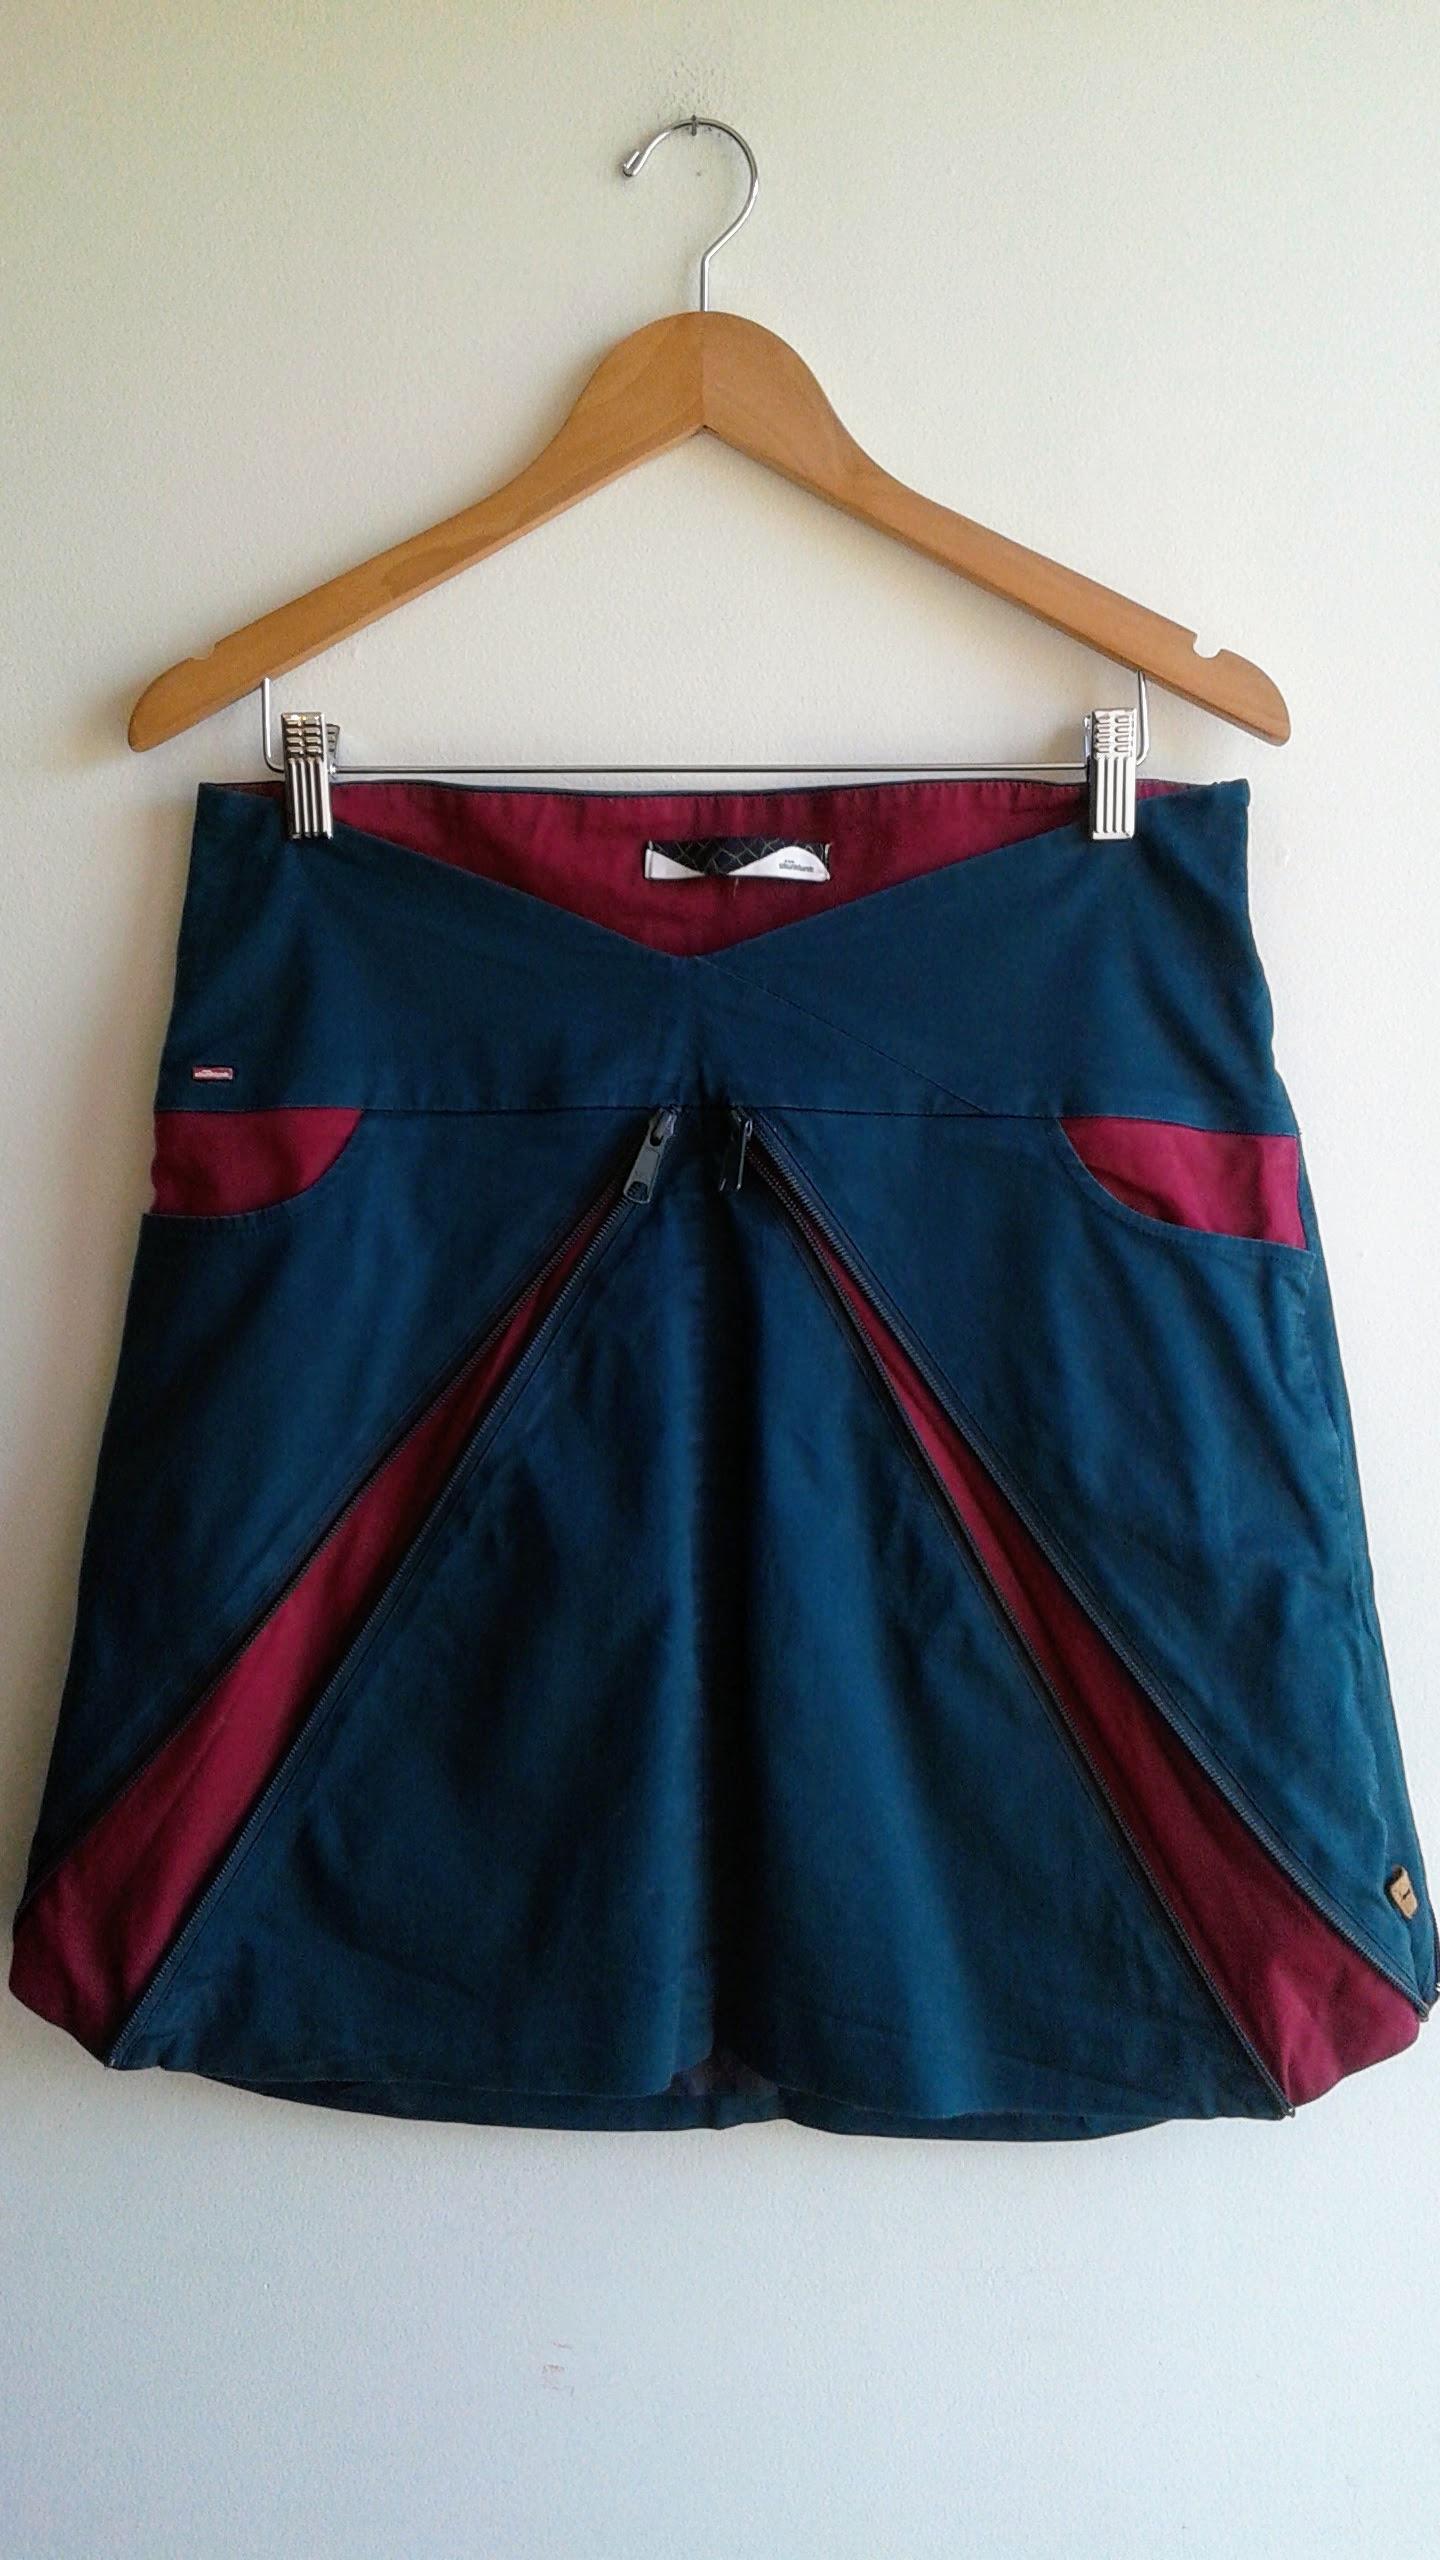 Skunkpunk skirt; Size M, $28